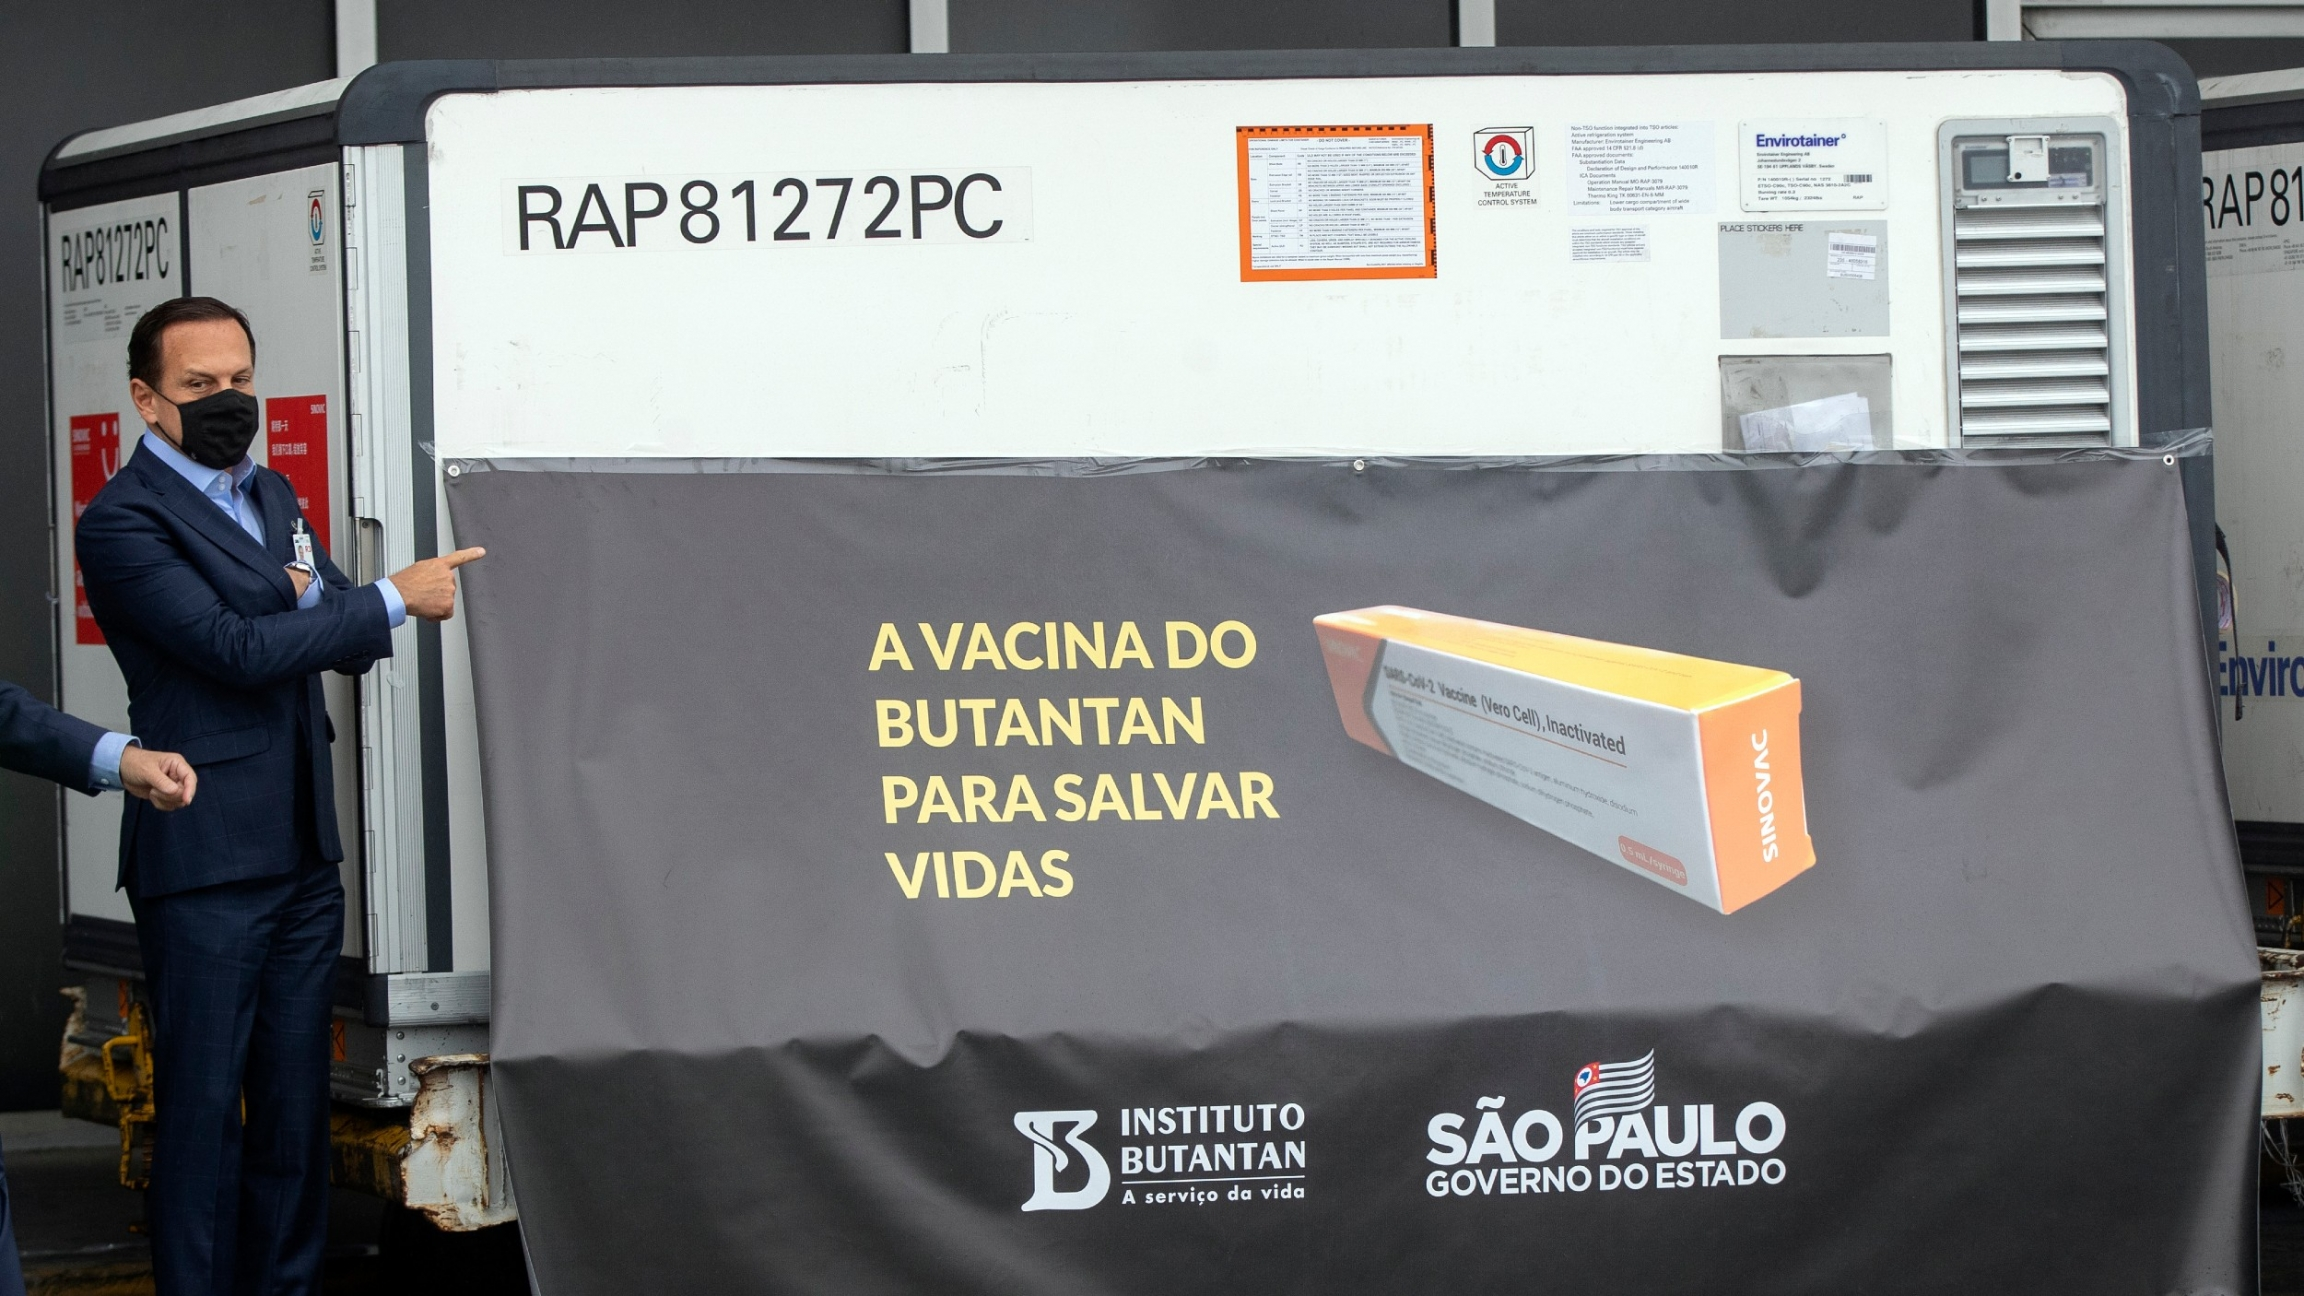 Brazil Needs China S Shot But Bolsonaro Prefers Oxford Jab